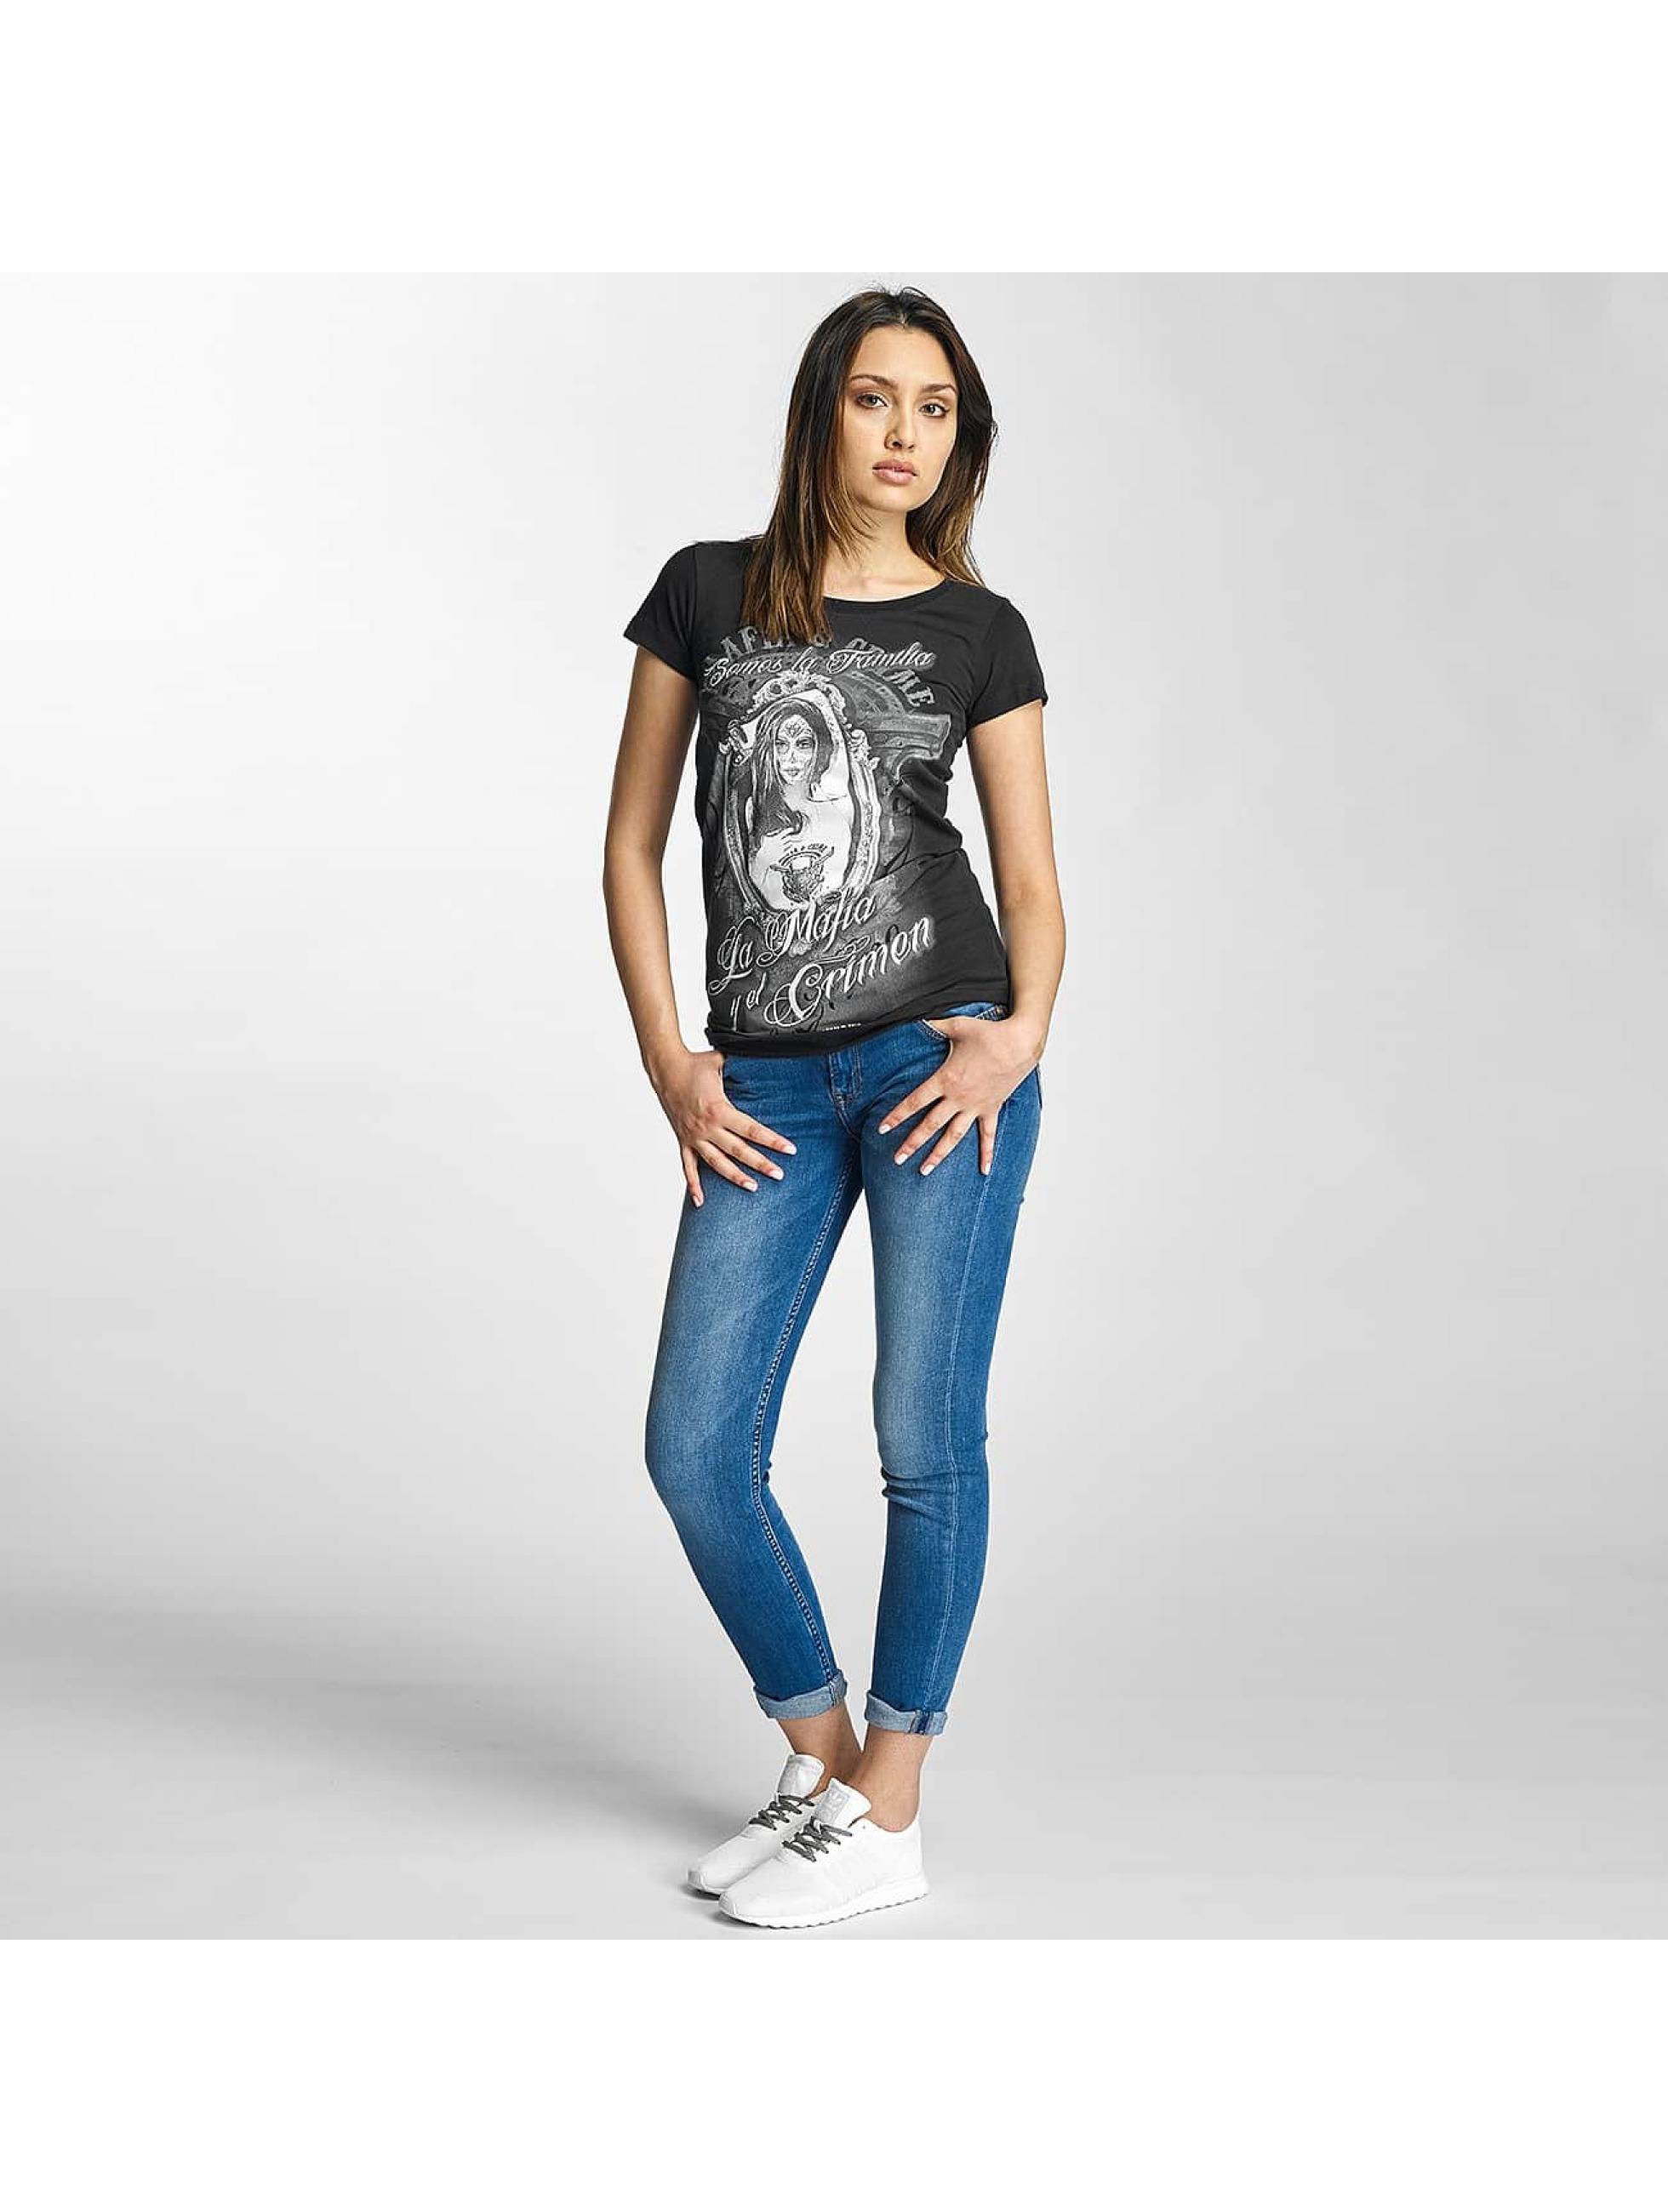 Mafia & Crime T-Shirt Somos La Familia Girls black